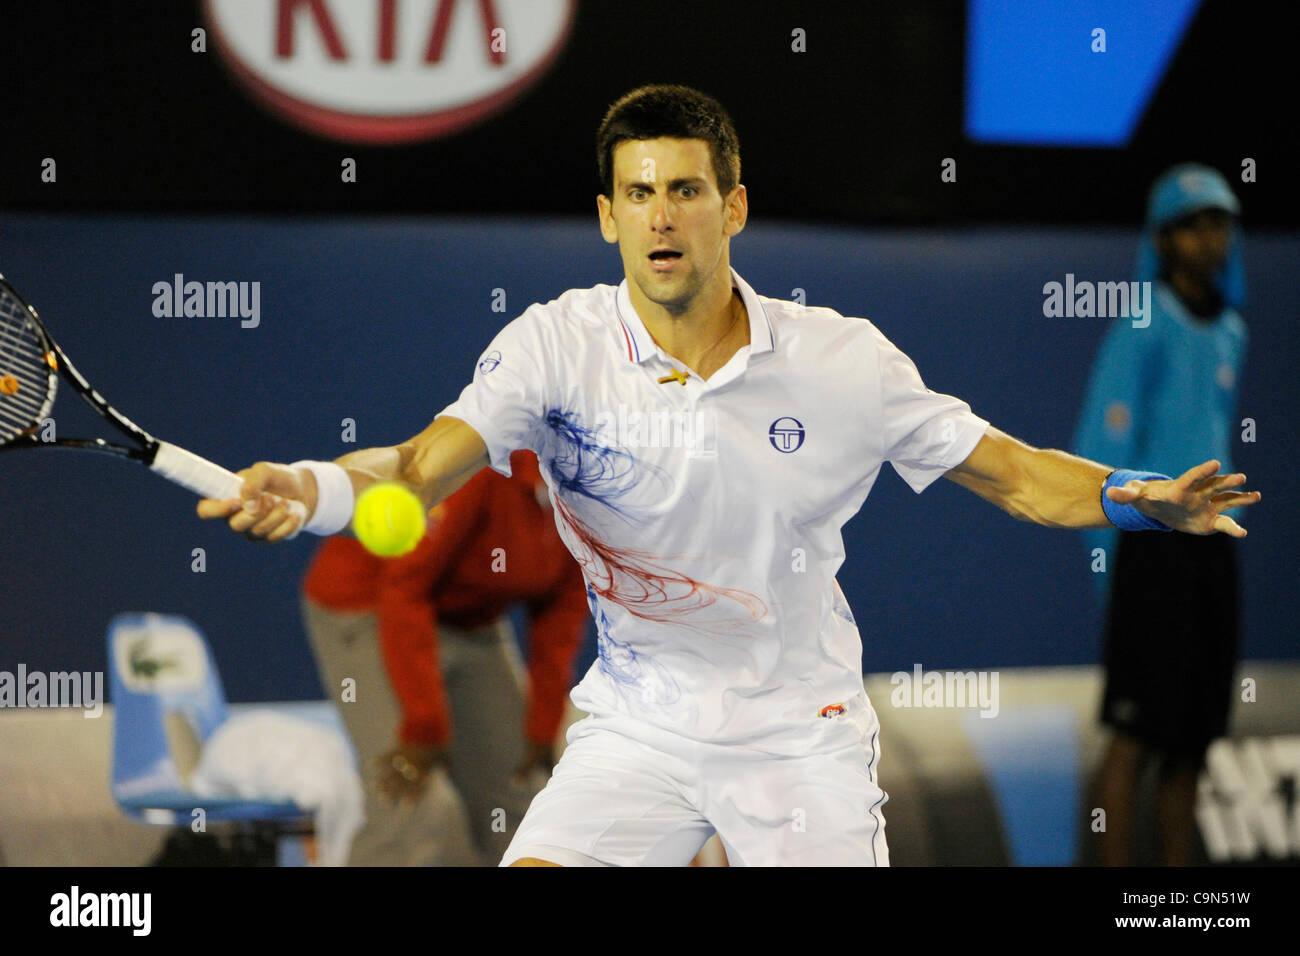 29.01.2012 Australian Open Tennis Mens Final from Melbourne Park. Novak Djokovic (SRB) returns a shot in his match - Stock Image